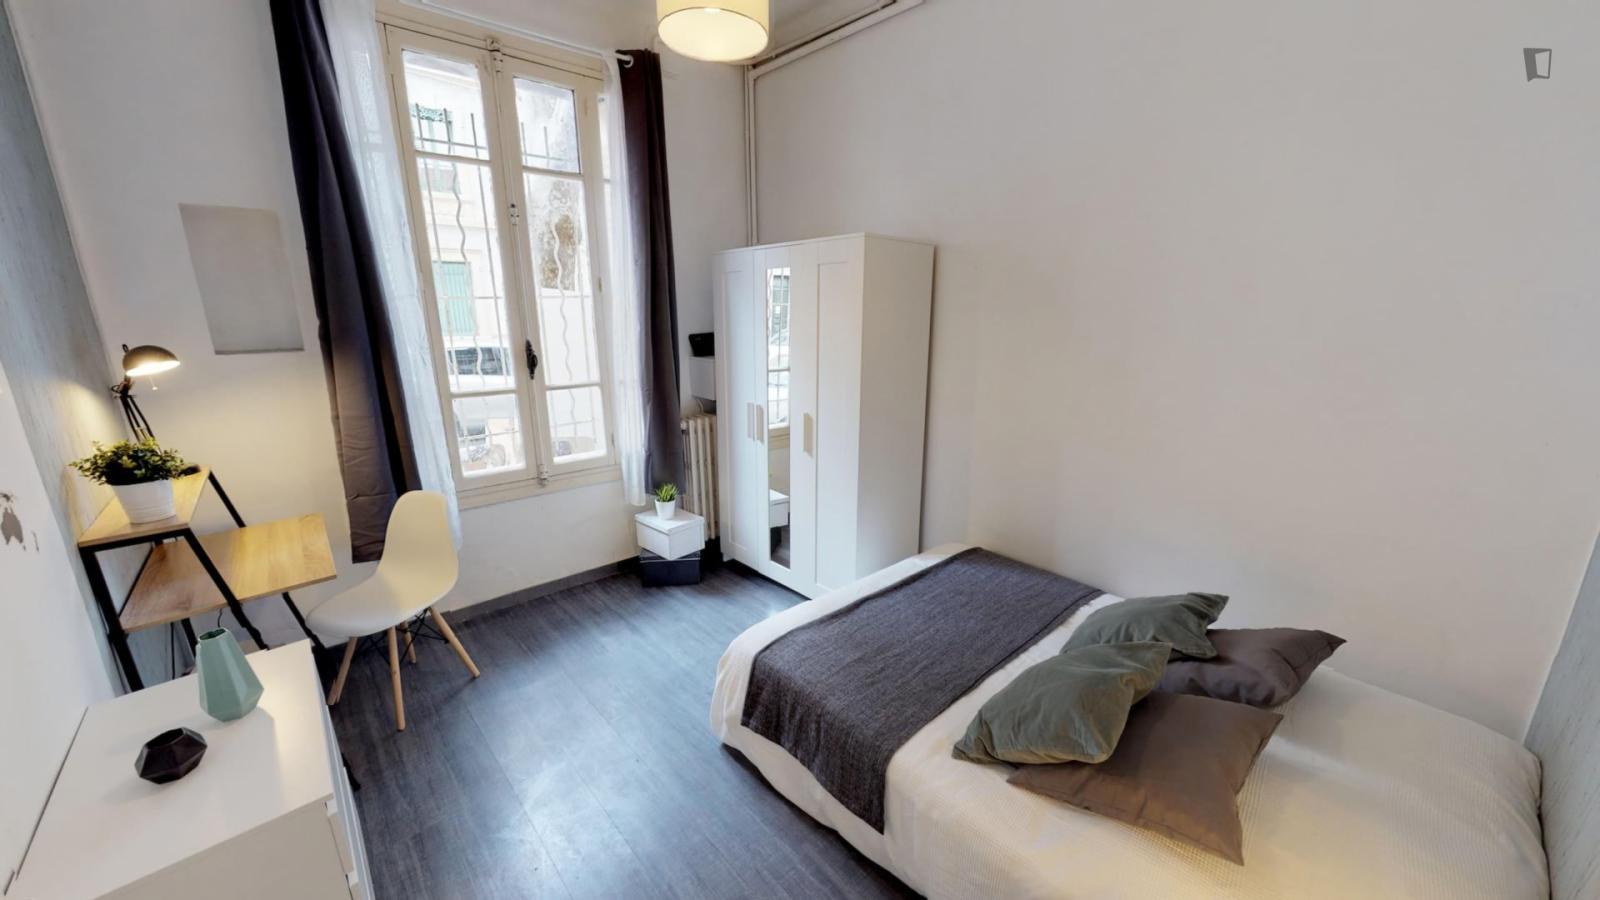 Boulevard Renouvier, Montpellier, FR-34 - 453 EUR/ month